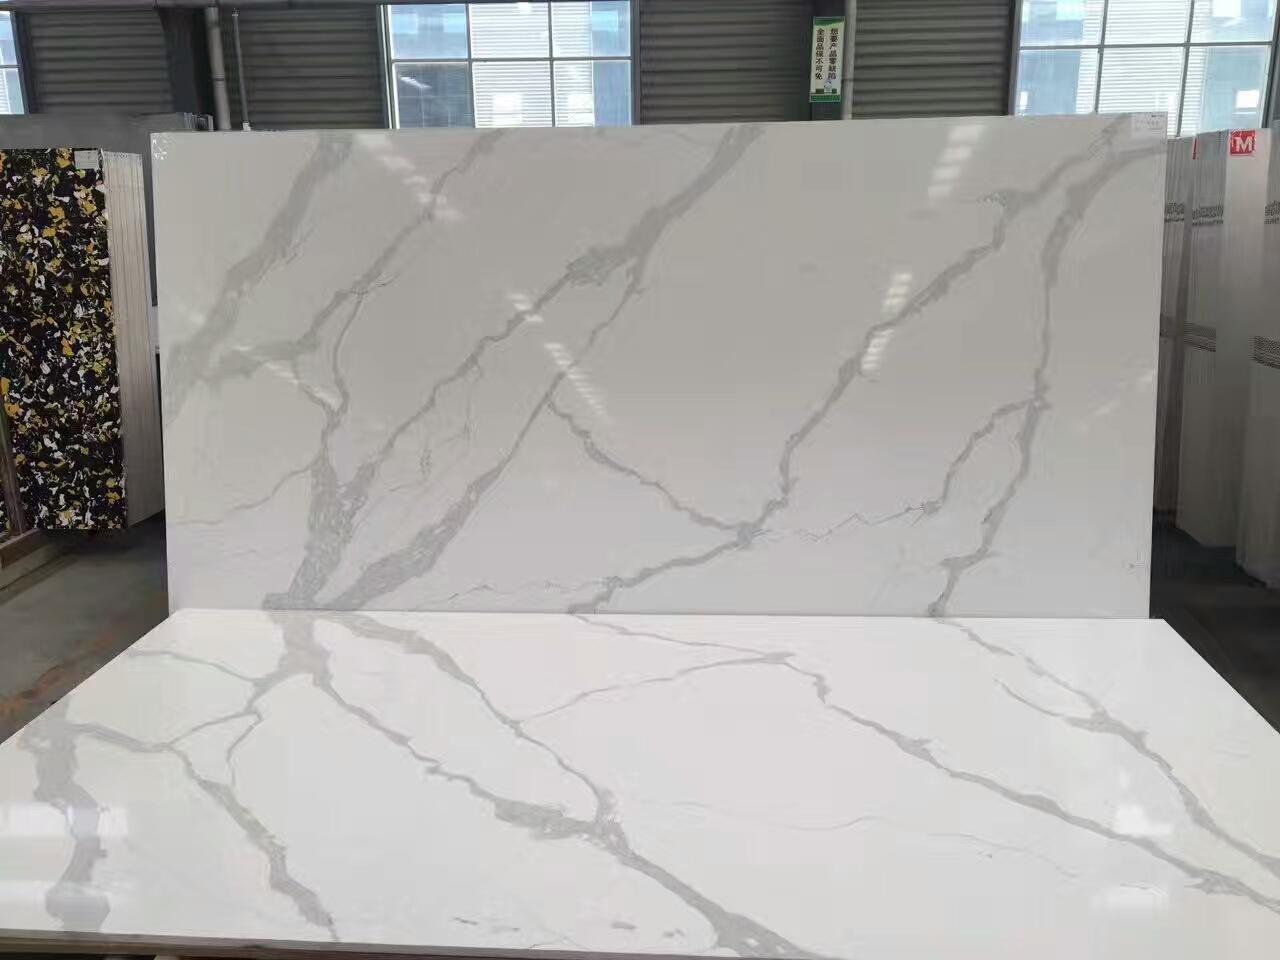 white quartz with grey veins